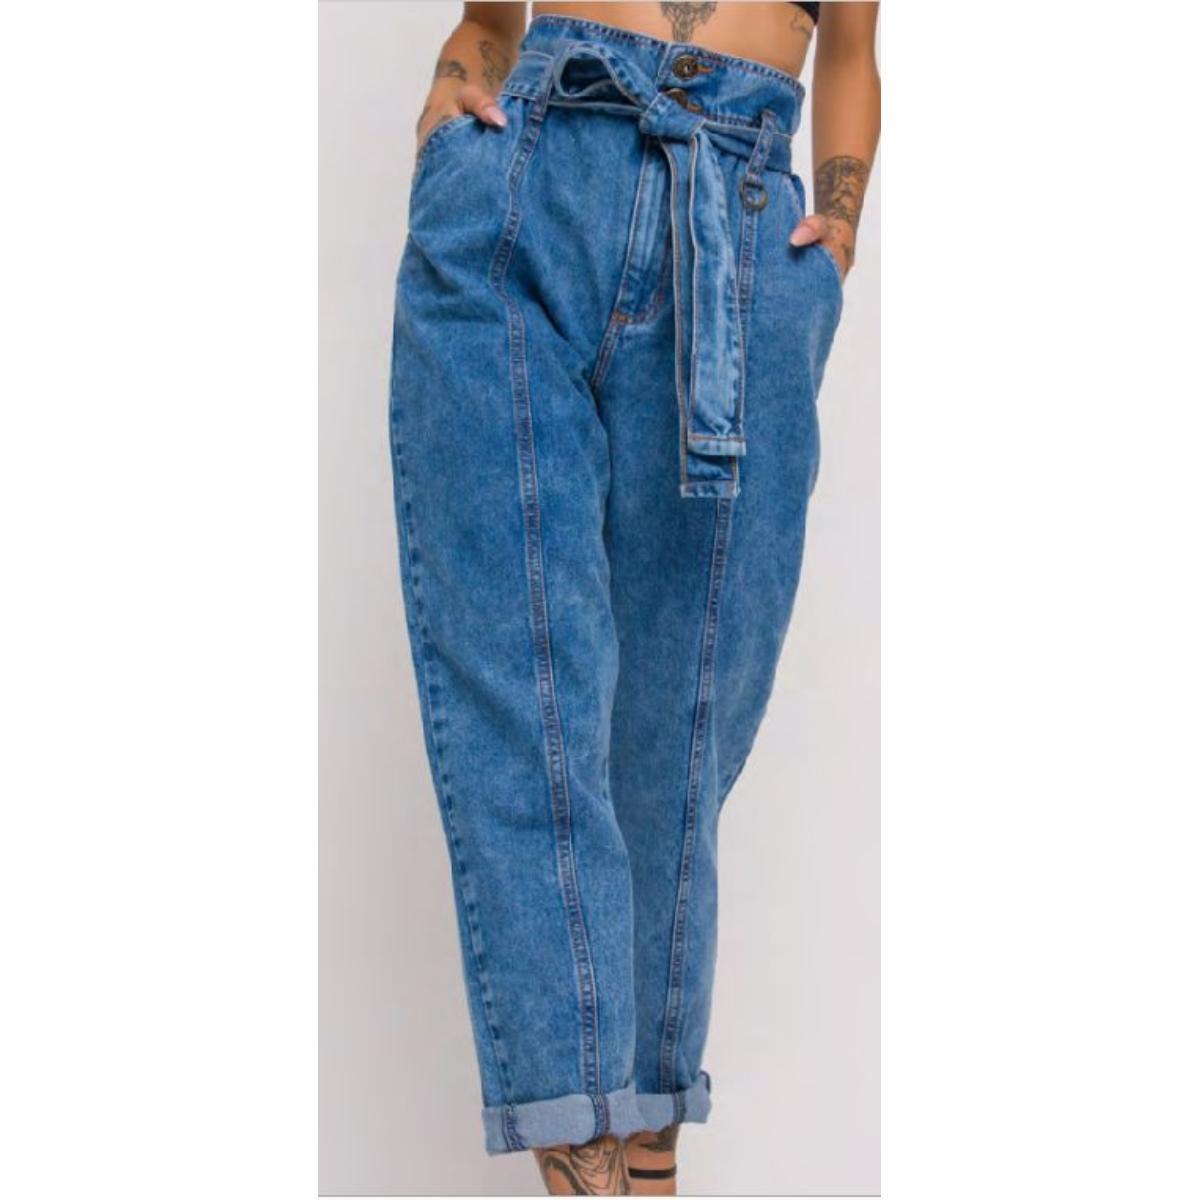 Calça Feminina Coca-cola Clothing 23203312 600  Jeans